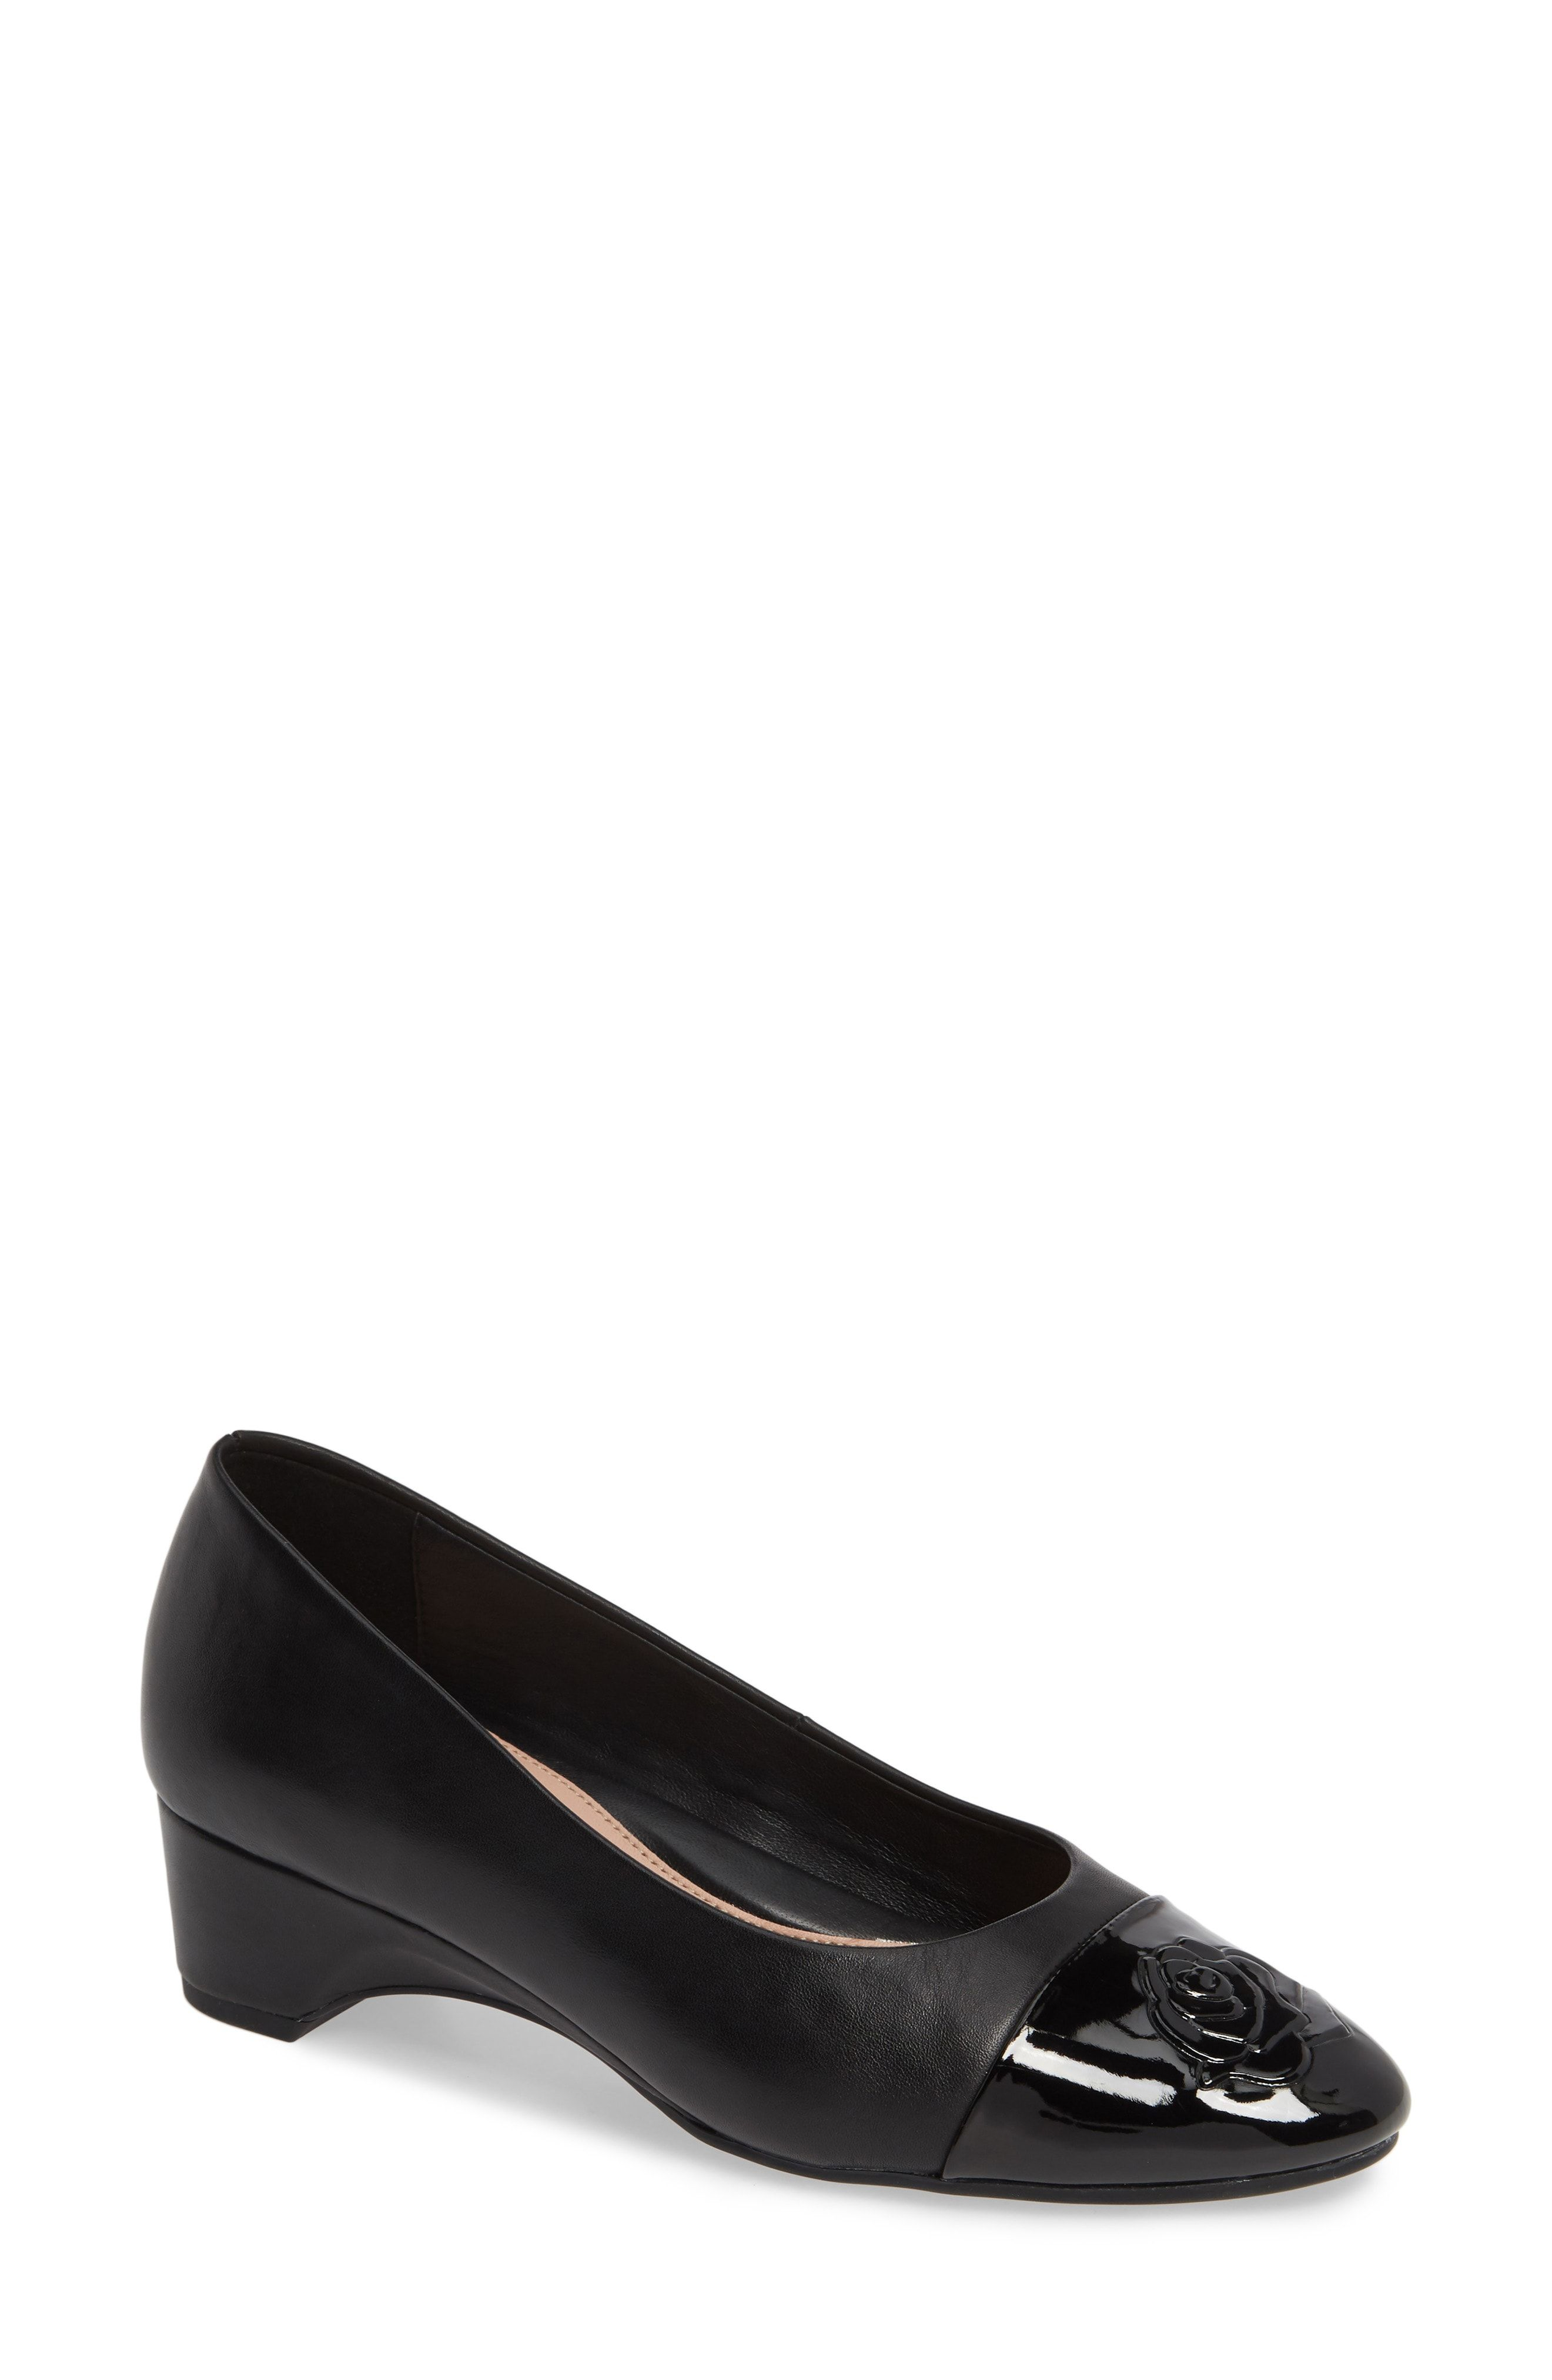 81ac4196843a TARYN ROSE BABE CAP TOE PUMP.  tarynrose  shoes